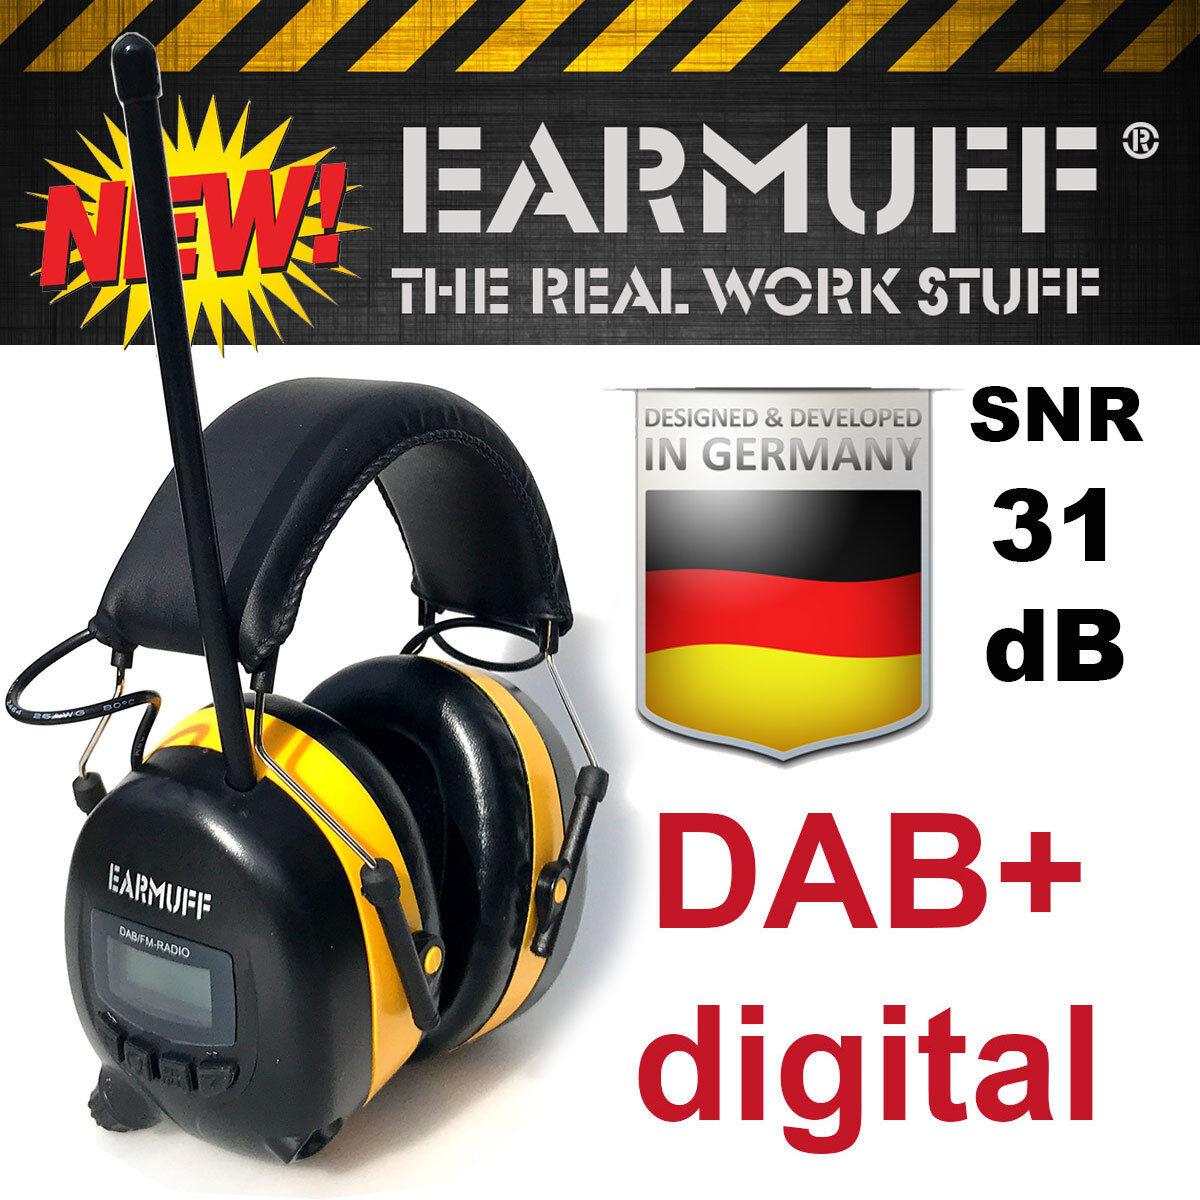 Original -31dB EARMUFF Gehörschutz Gehörschutz Gehörschutz DAB+ DIGITAL Radio mit Lithium Akku b55d7f